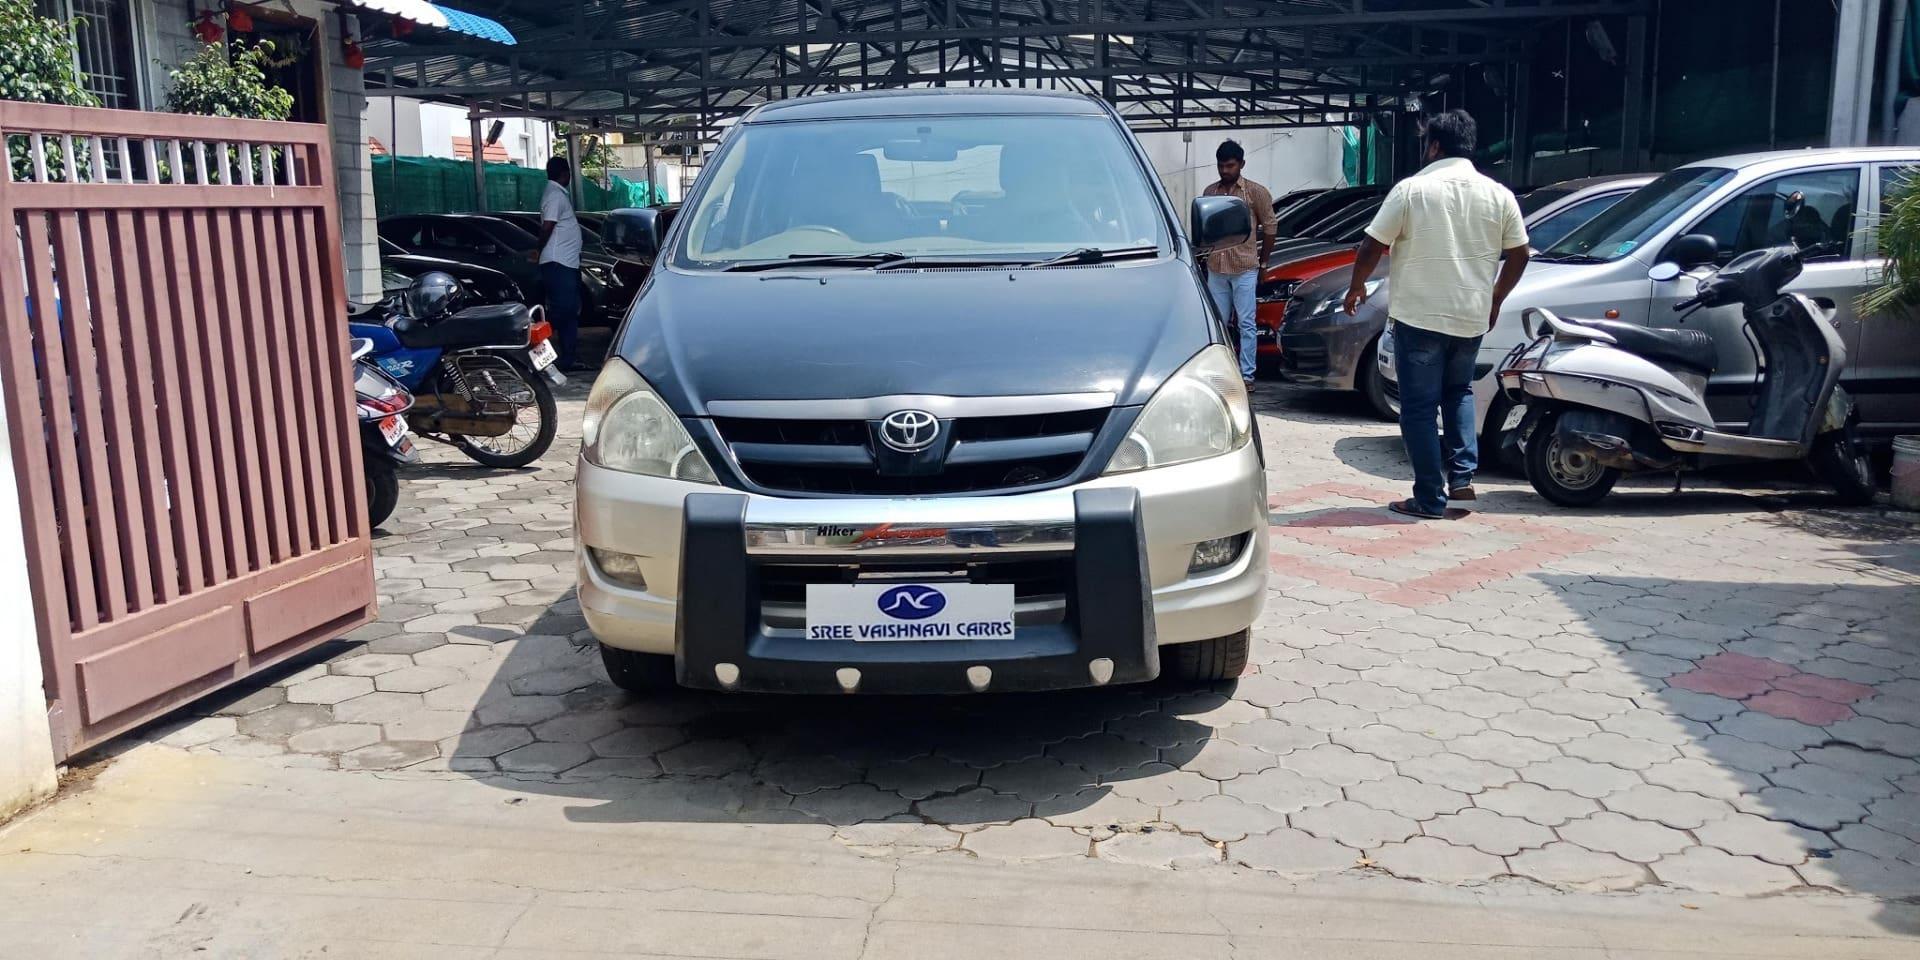 Toyota Innova 2004-2011 2.5 G4 Diesel 7-seater